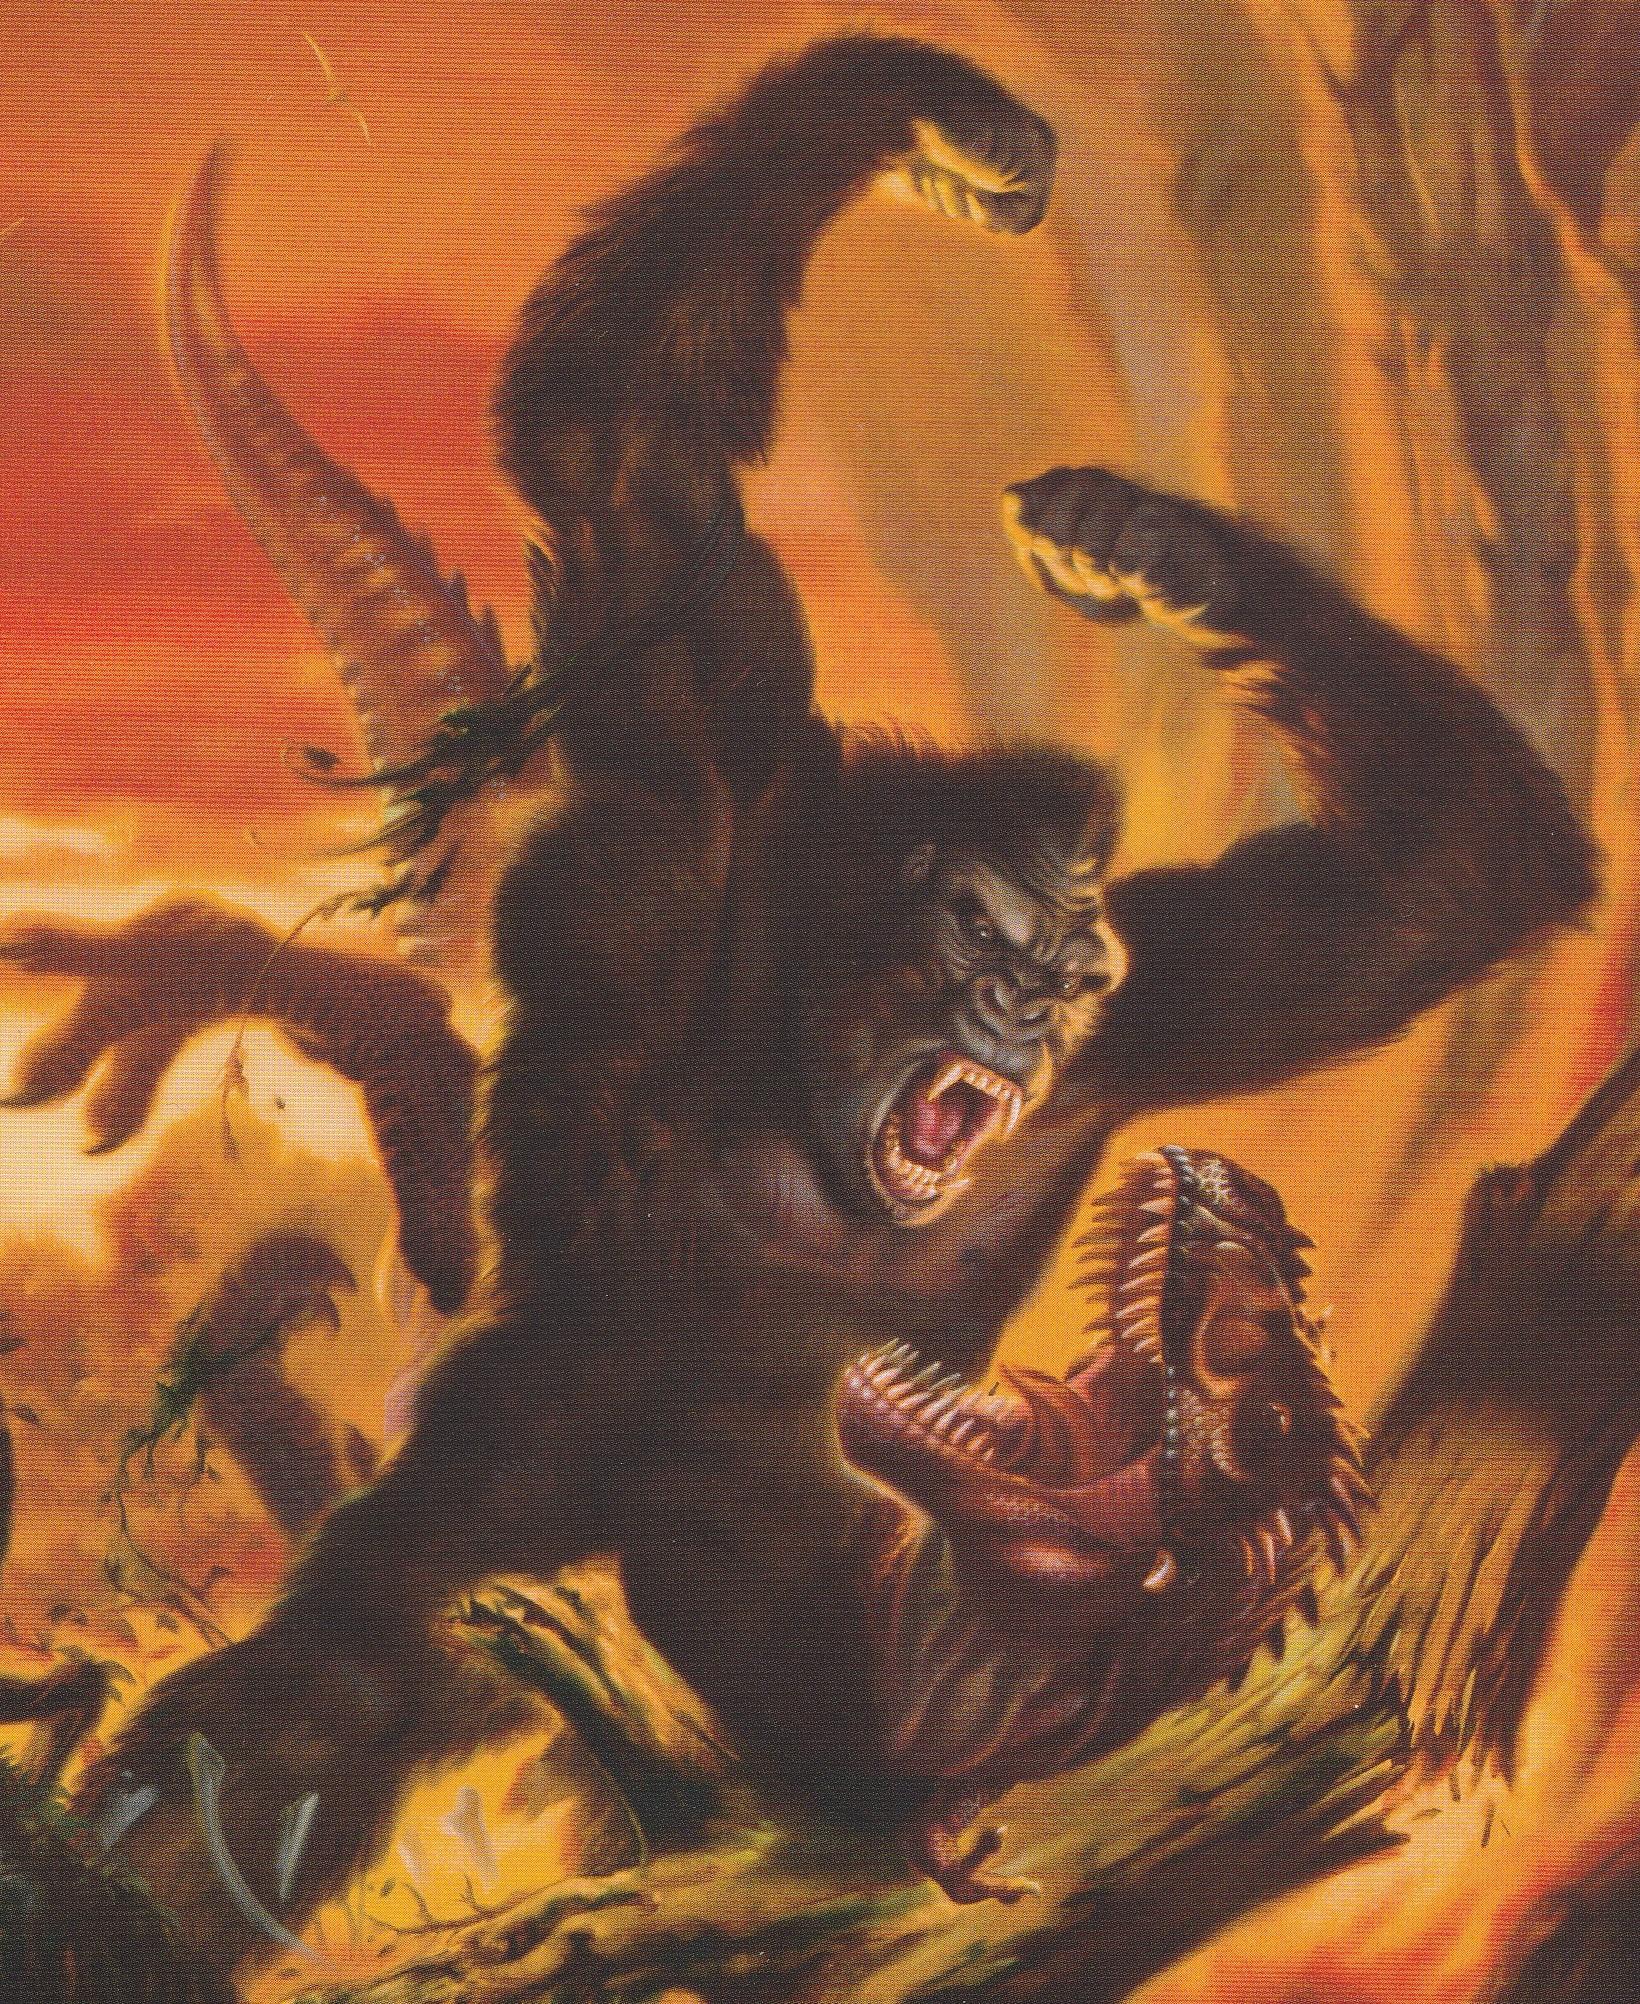 King Kong: Champion of Skull Island